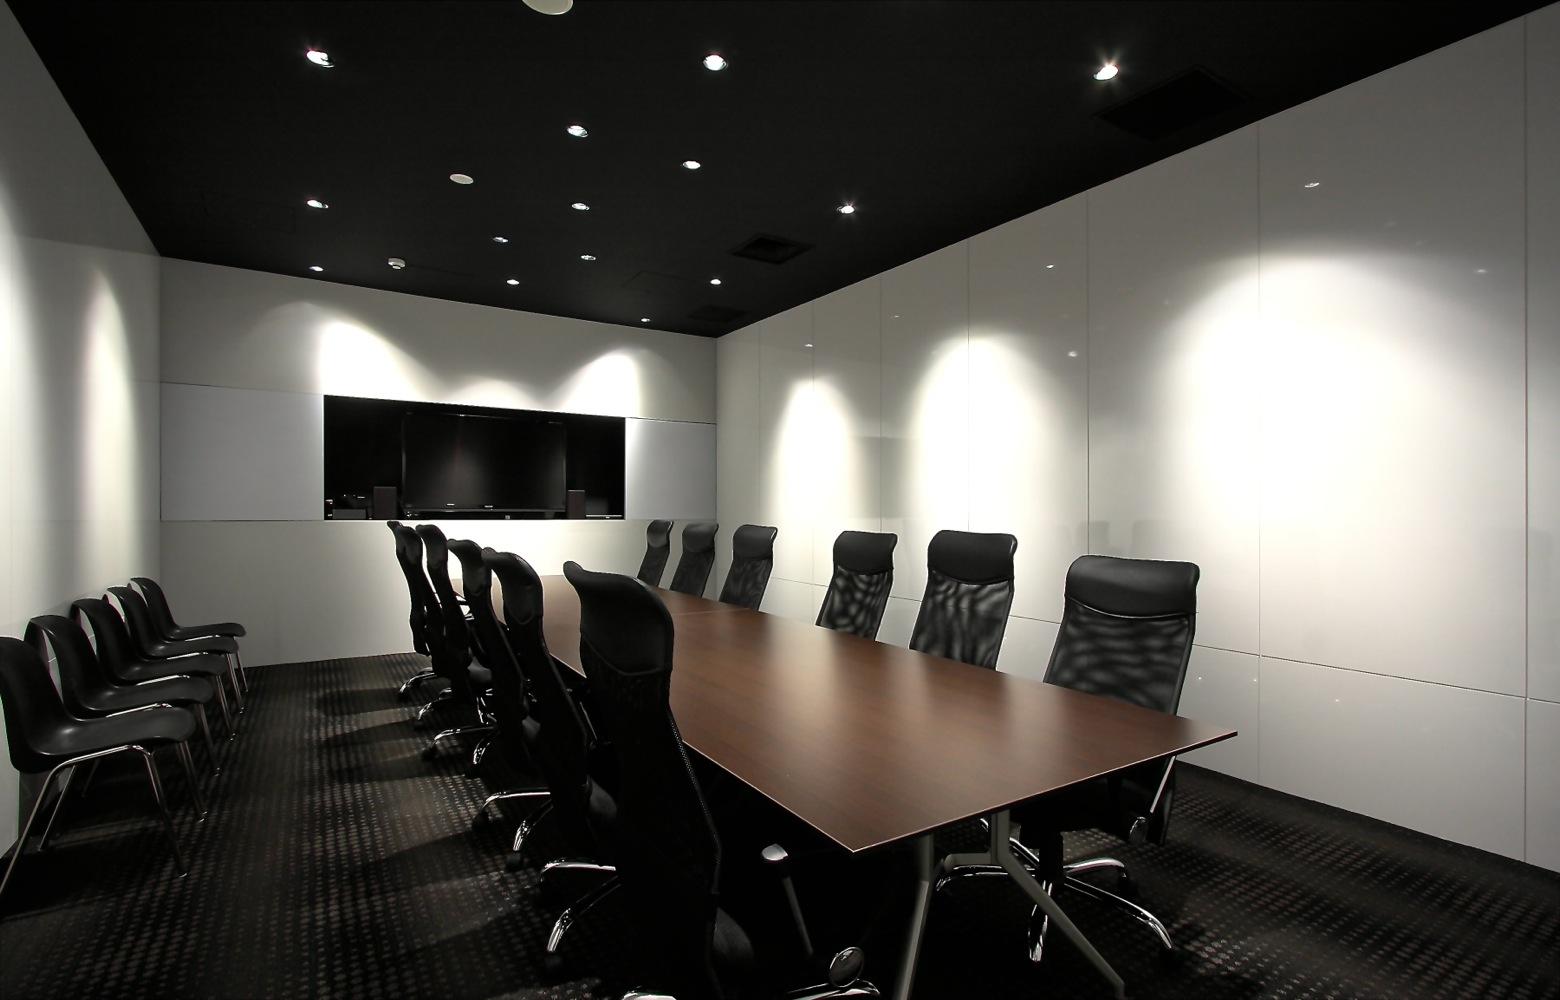 EMTG株式会社 Meeting Room_2 デザイン・レイアウト事例